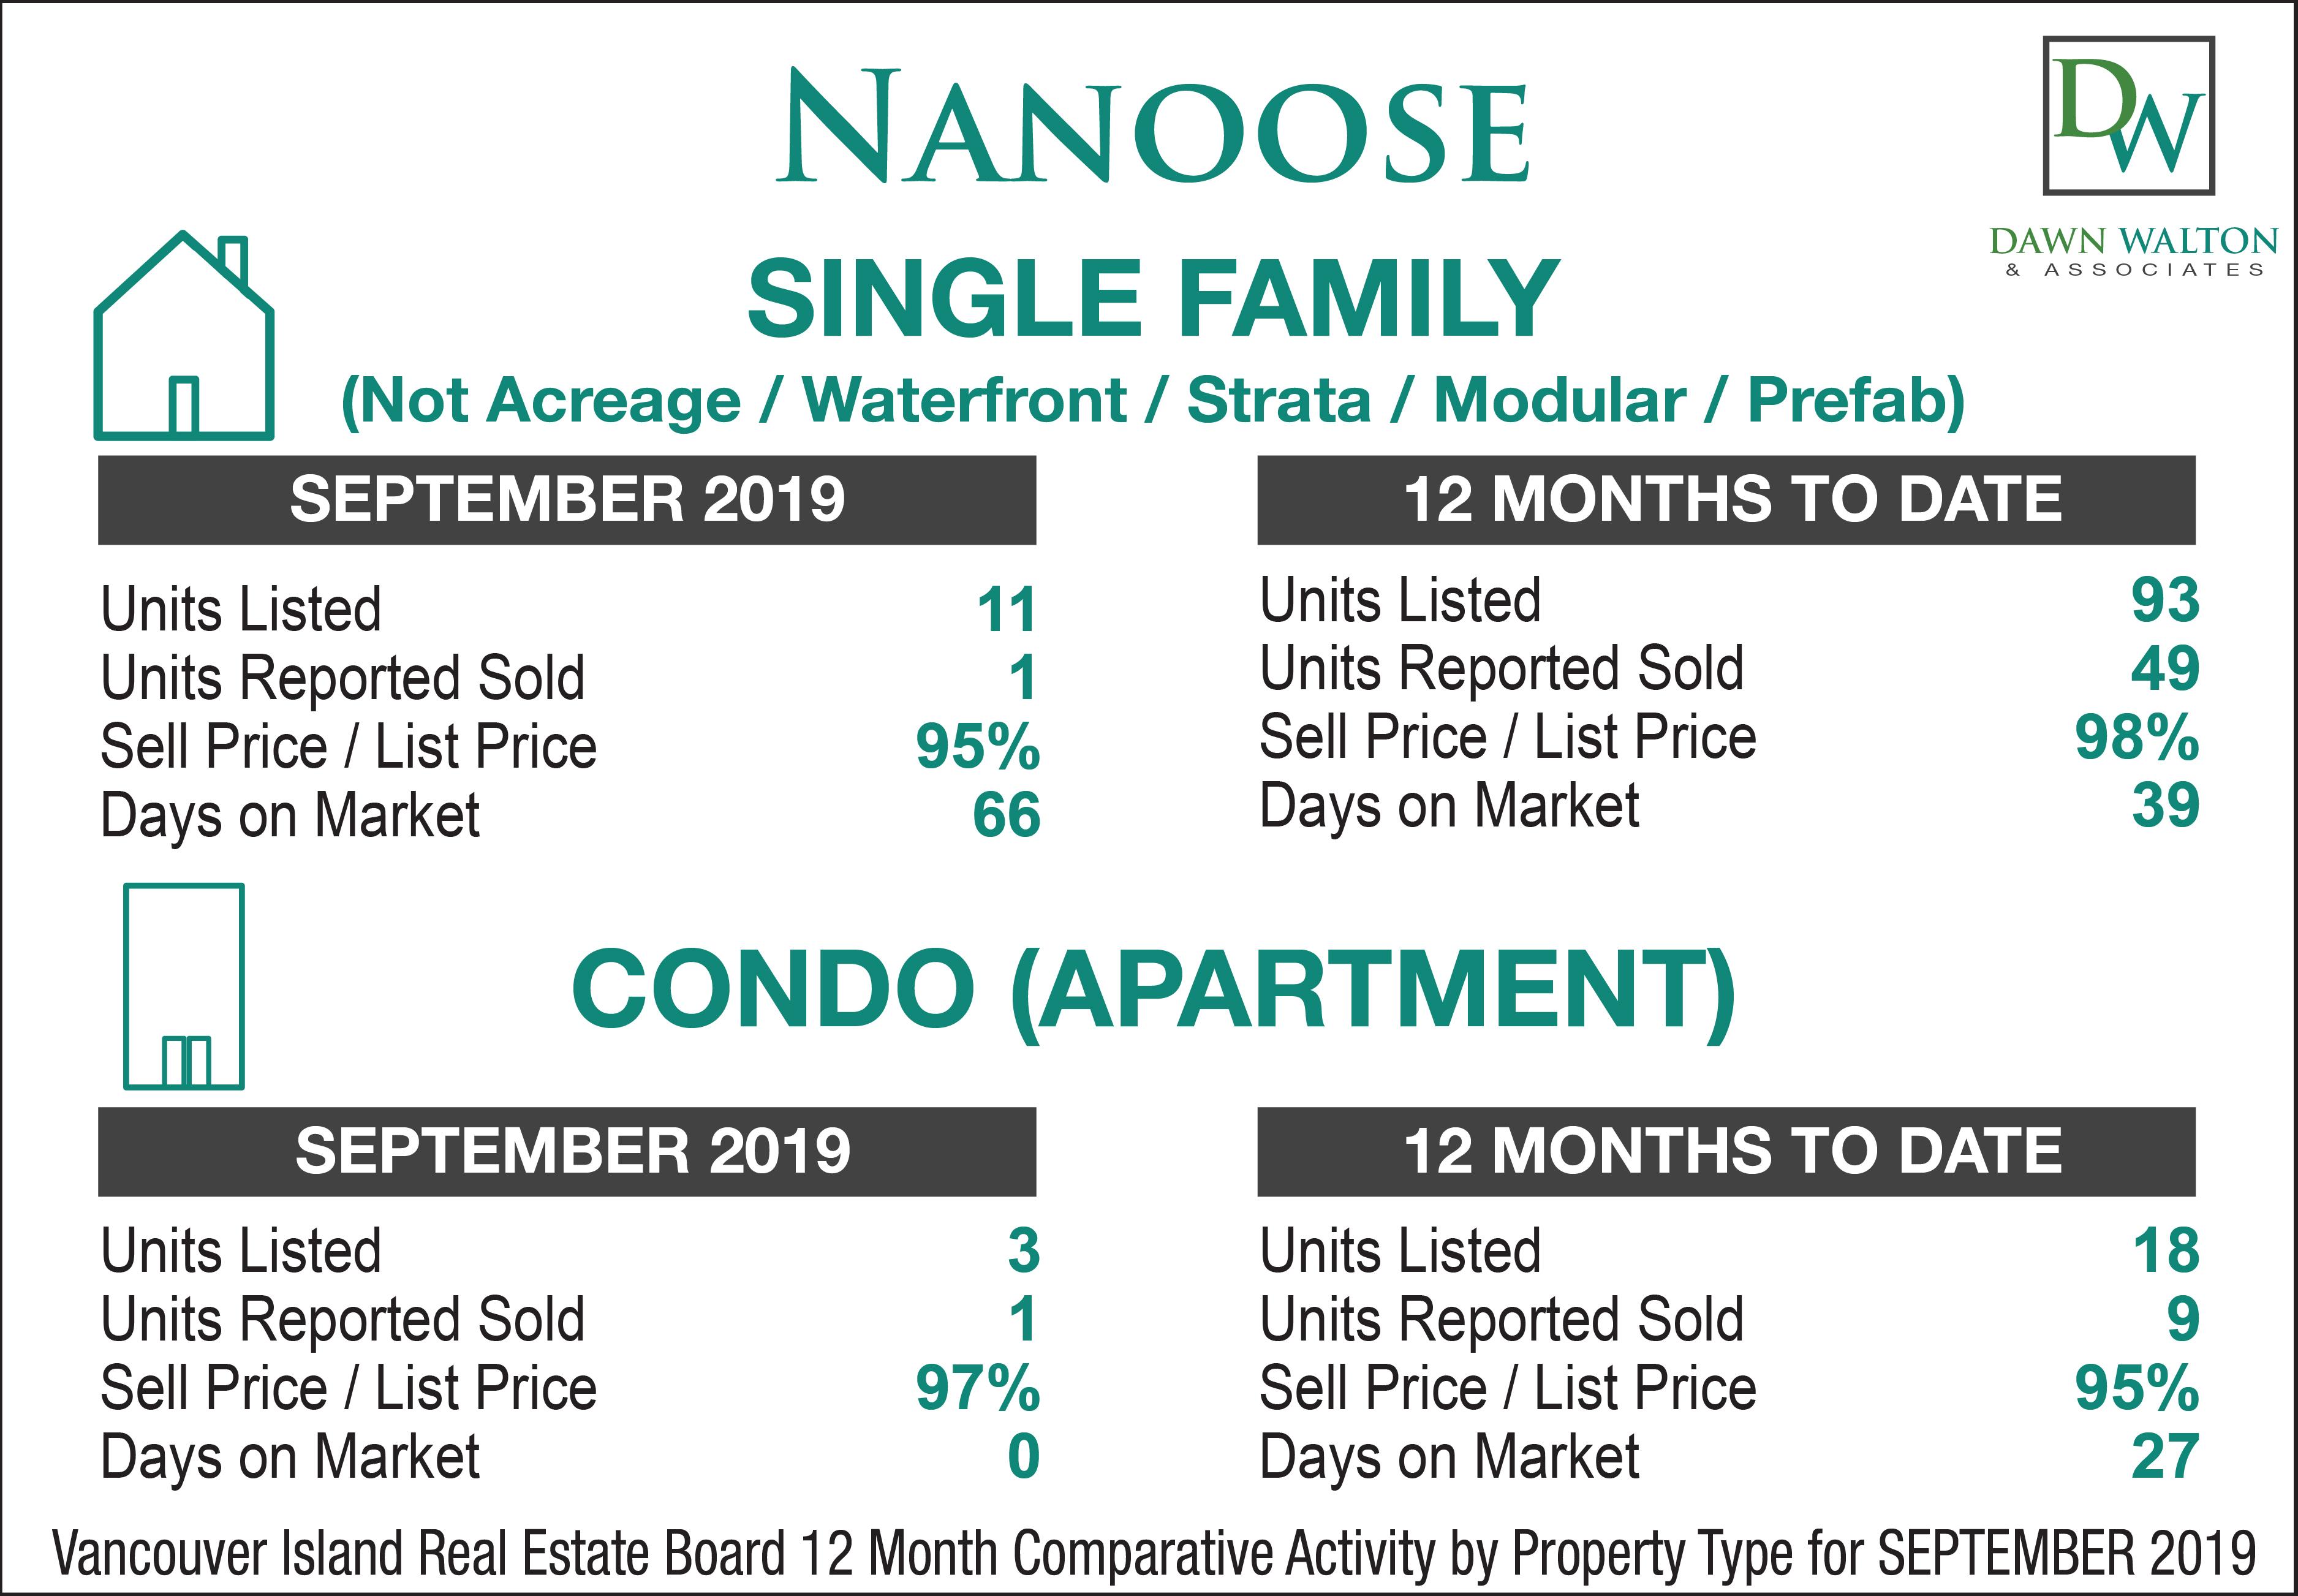 Nanoose Real Estate Market Stats September 2019 - Nanaimo Realtor Dawn Walton